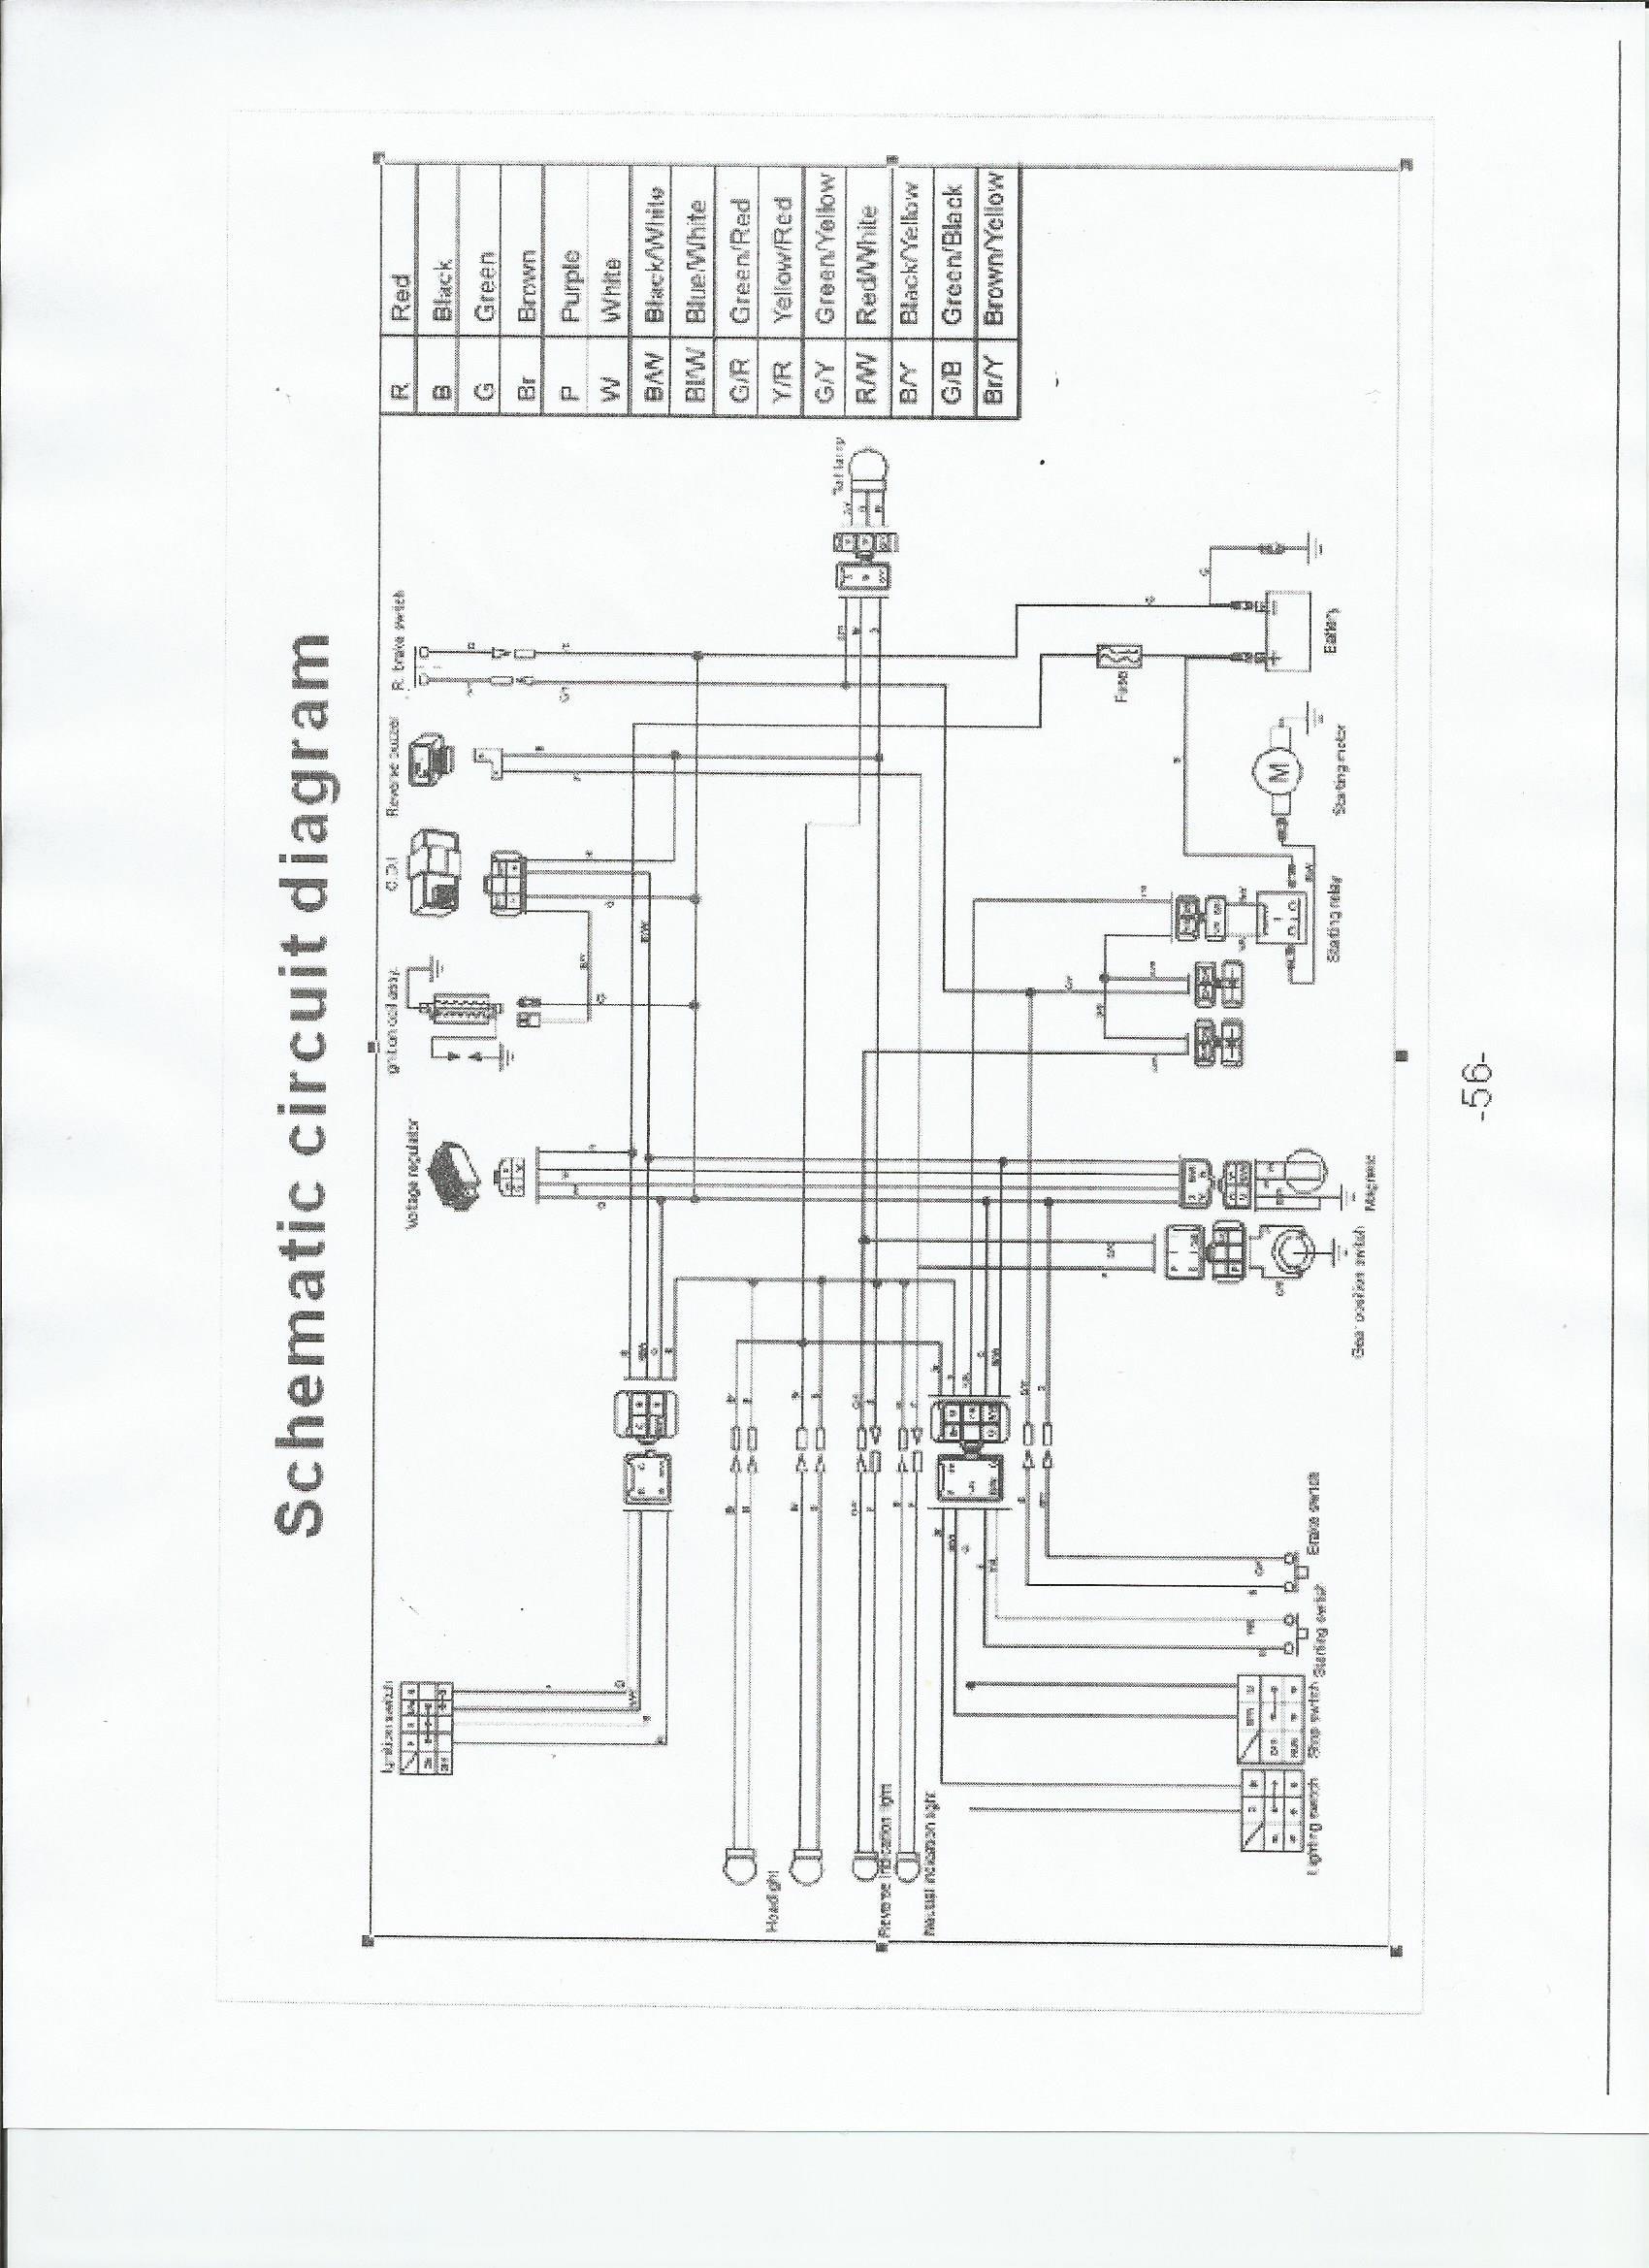 unique jonway 49cc gy6 scooter wiring diagram ideas electrical rh piotomar info GY6 Regulator Wiring Diagram 250Cc Scooter Wiring Diagram